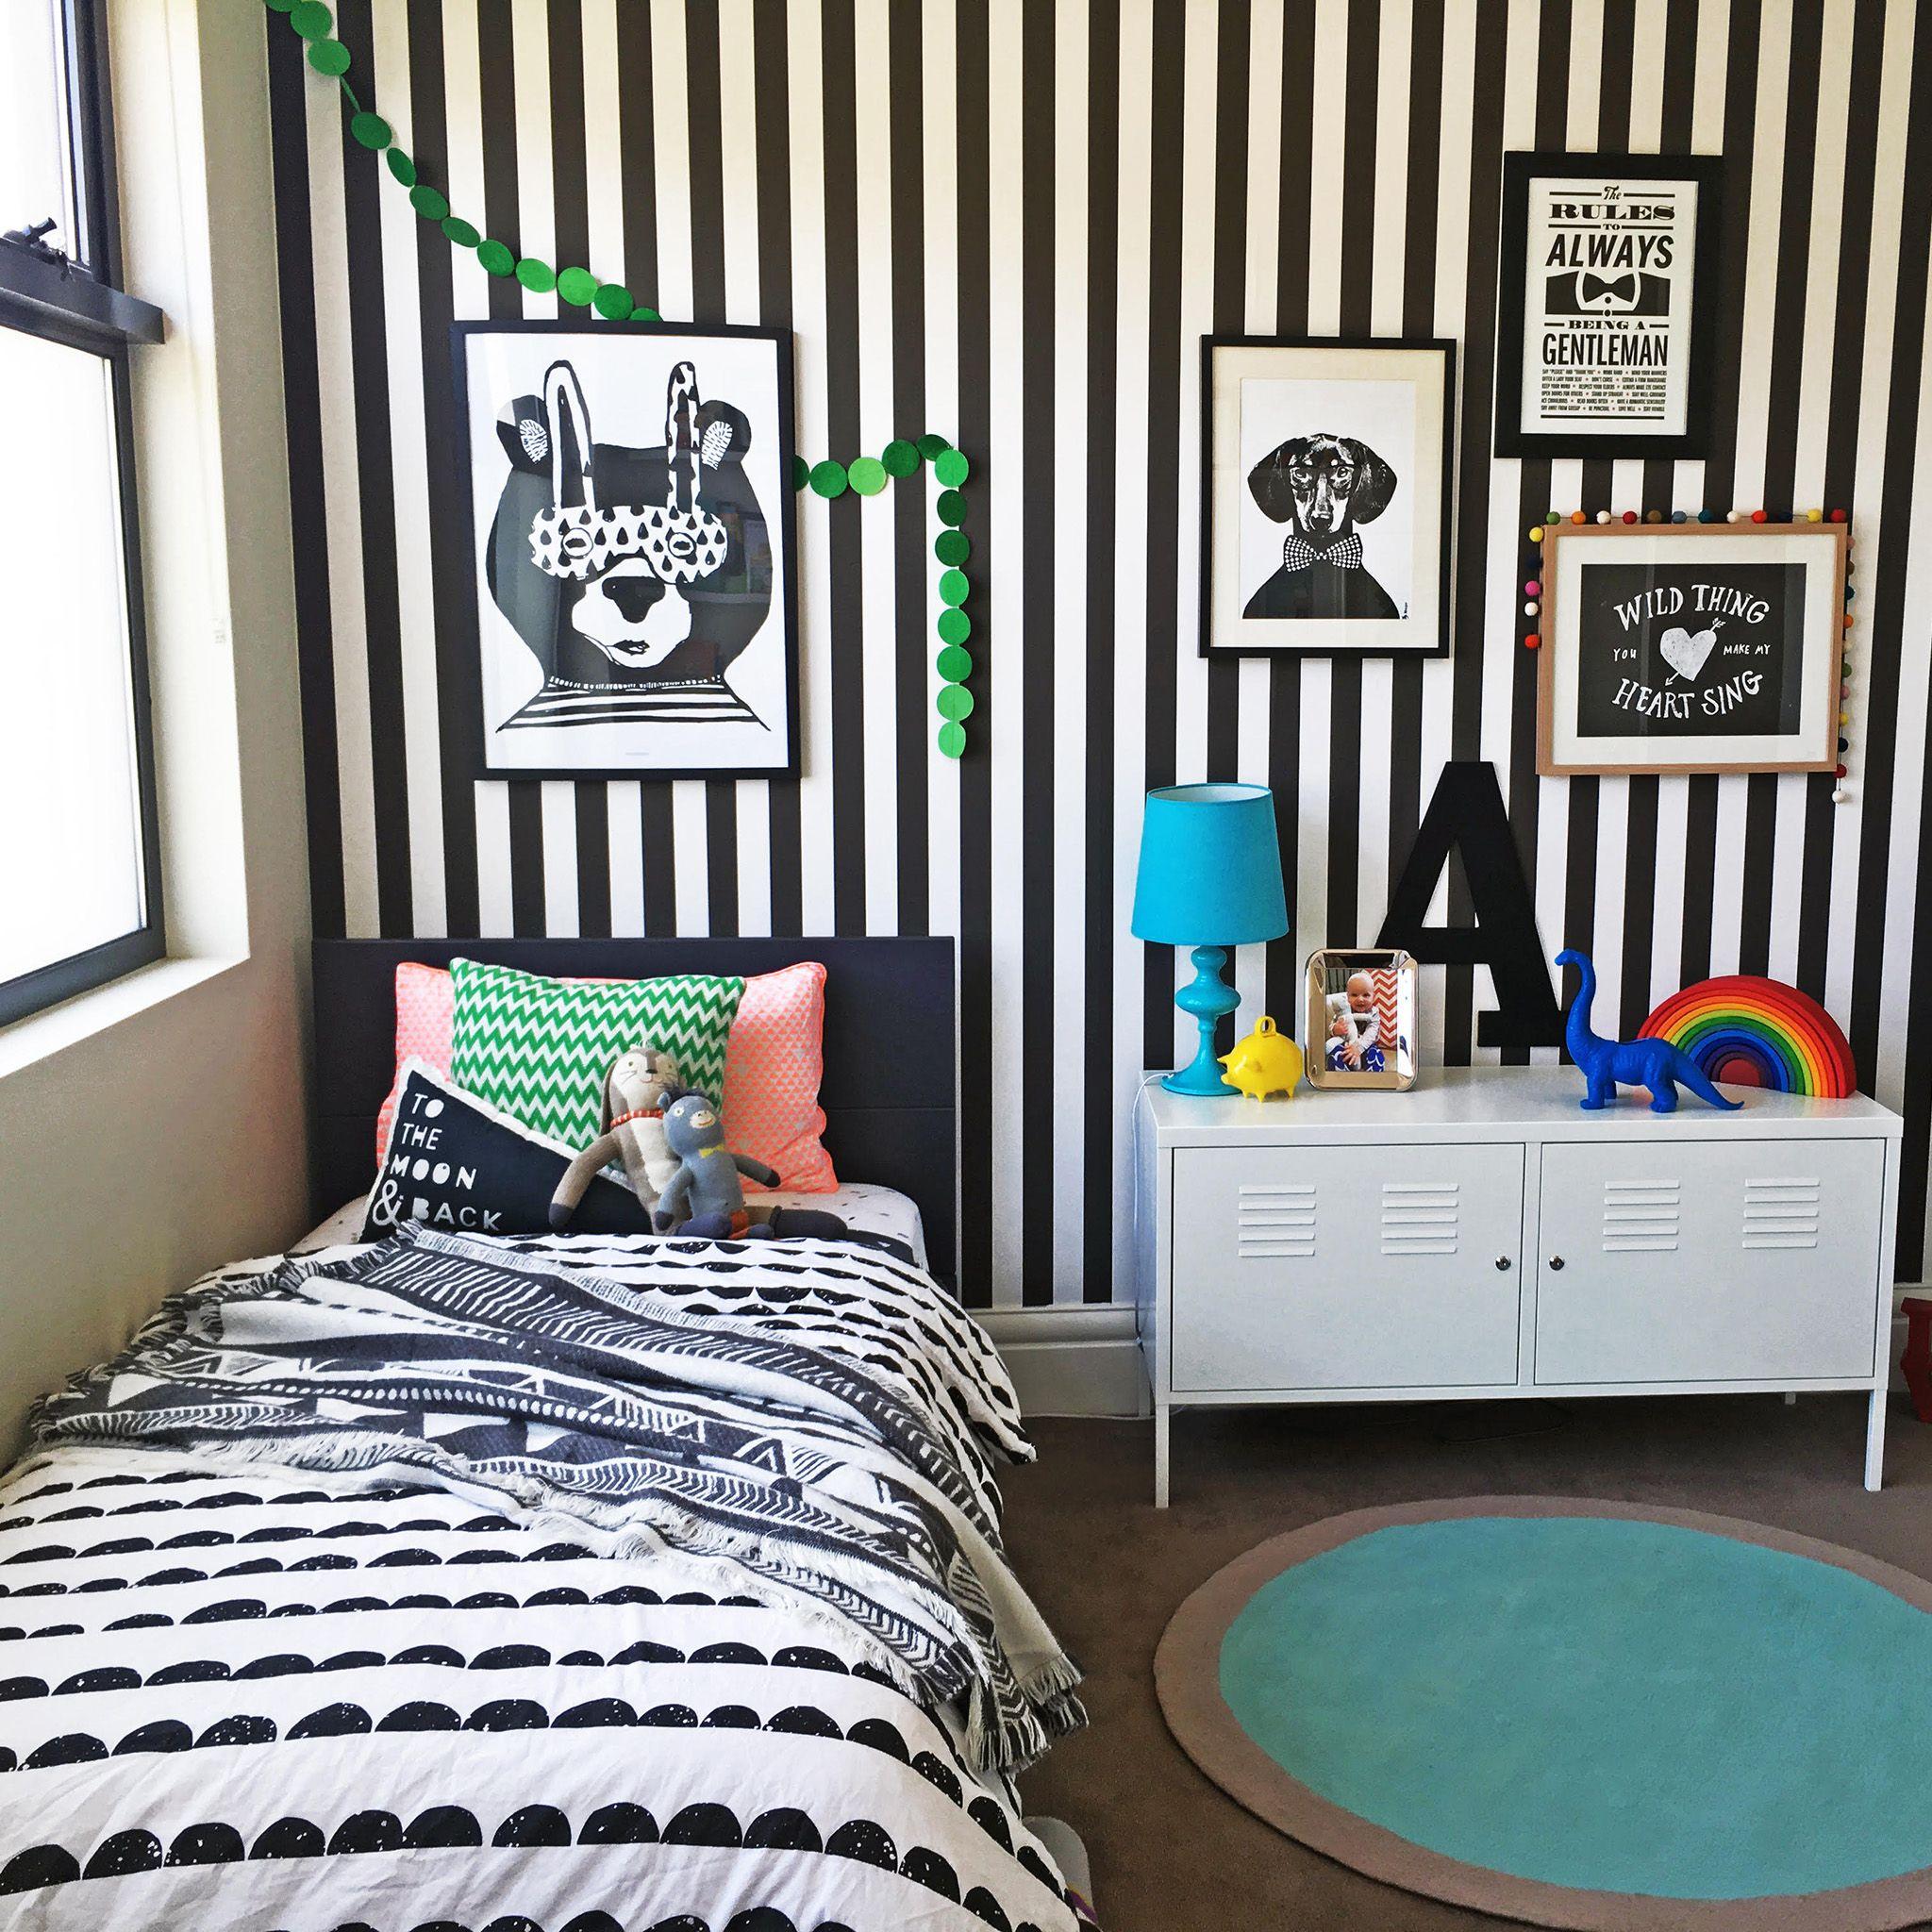 Stripes Wallpaper Buy Online Or Call 03 8774 2139 Stripe Wallpaper Bedroom Striped Wallpaper Stripe Removable Wallpaper